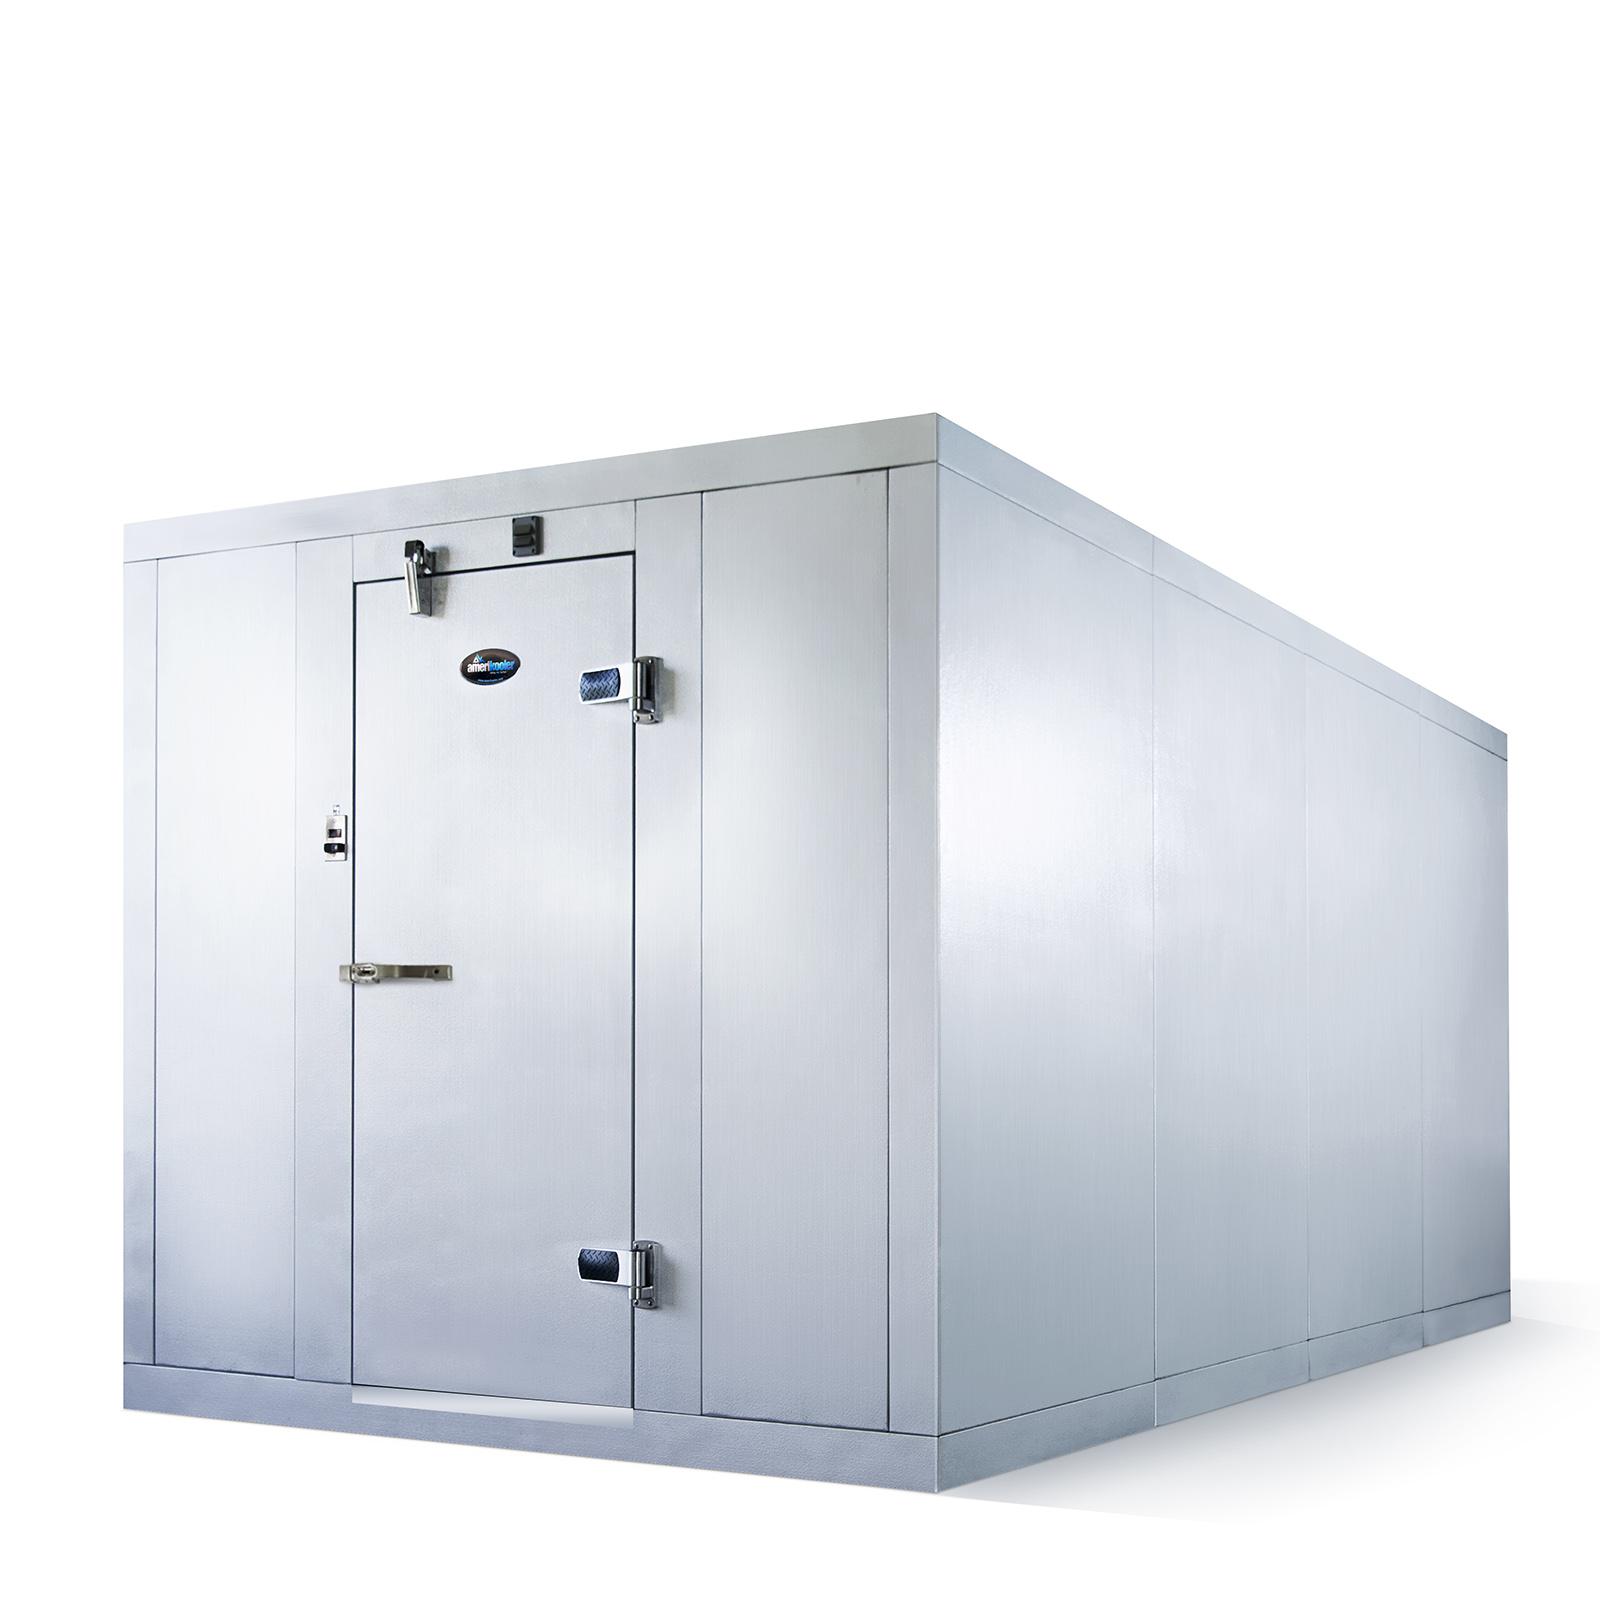 AmeriKooler DC081272**NBRC walk in cooler, modular, remote